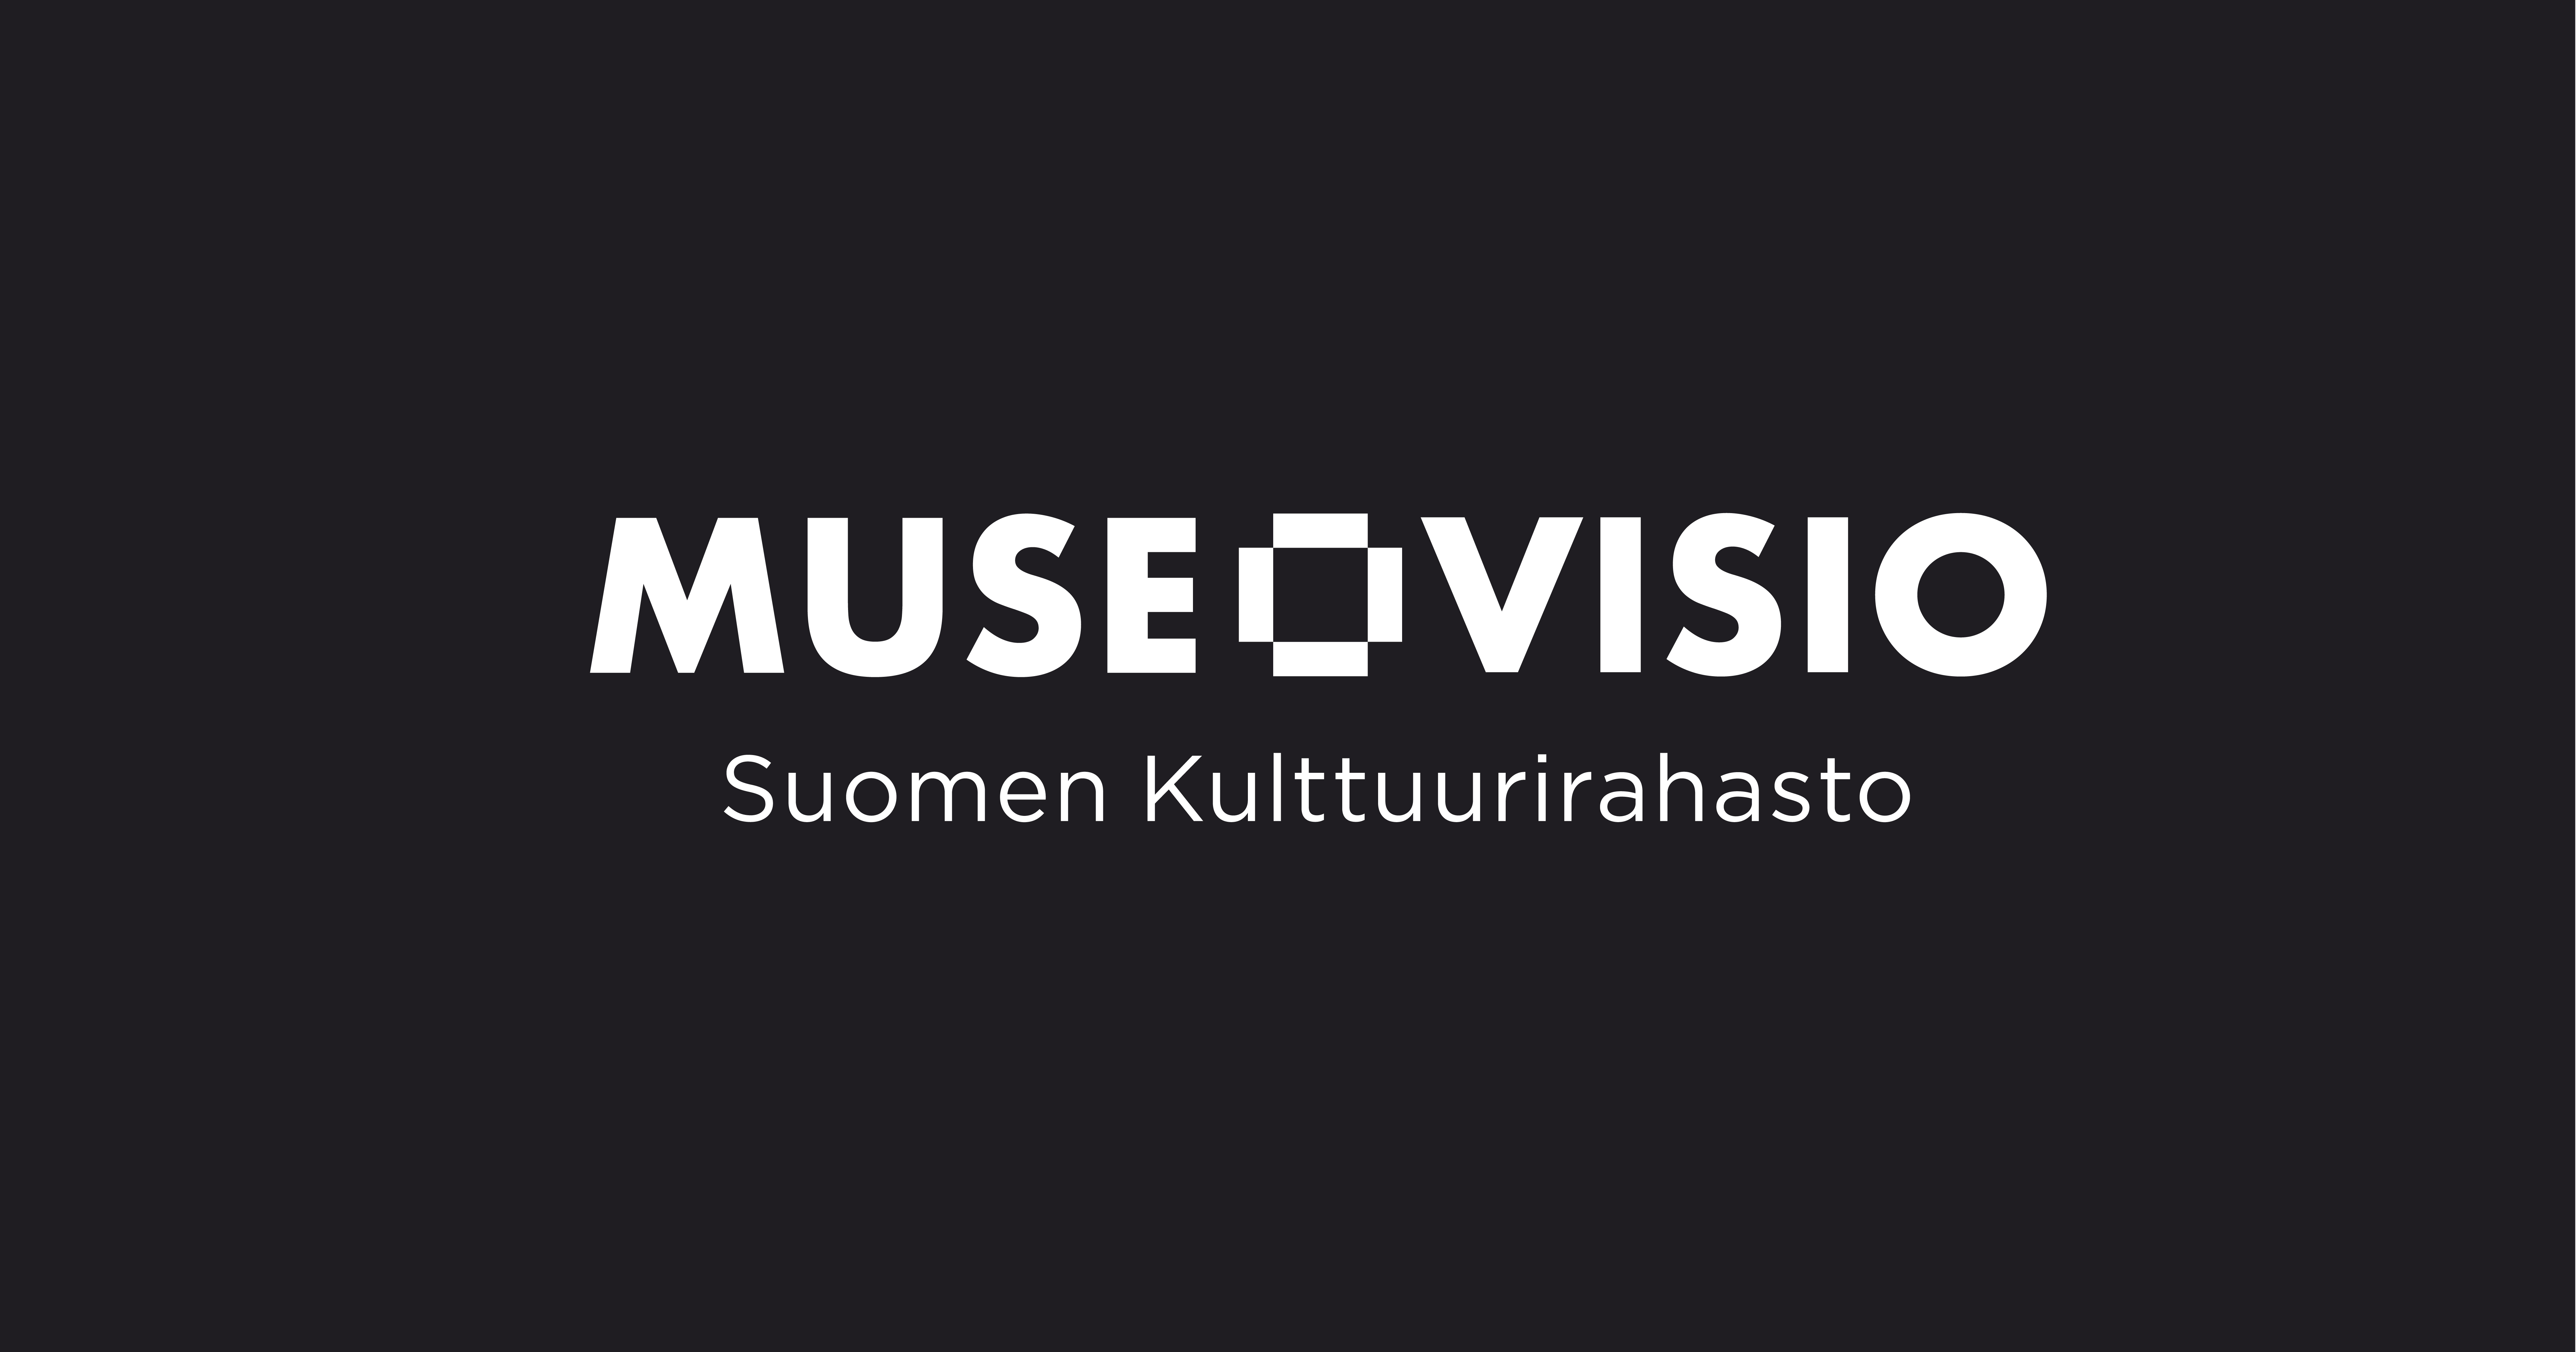 Museovisio_logo_2